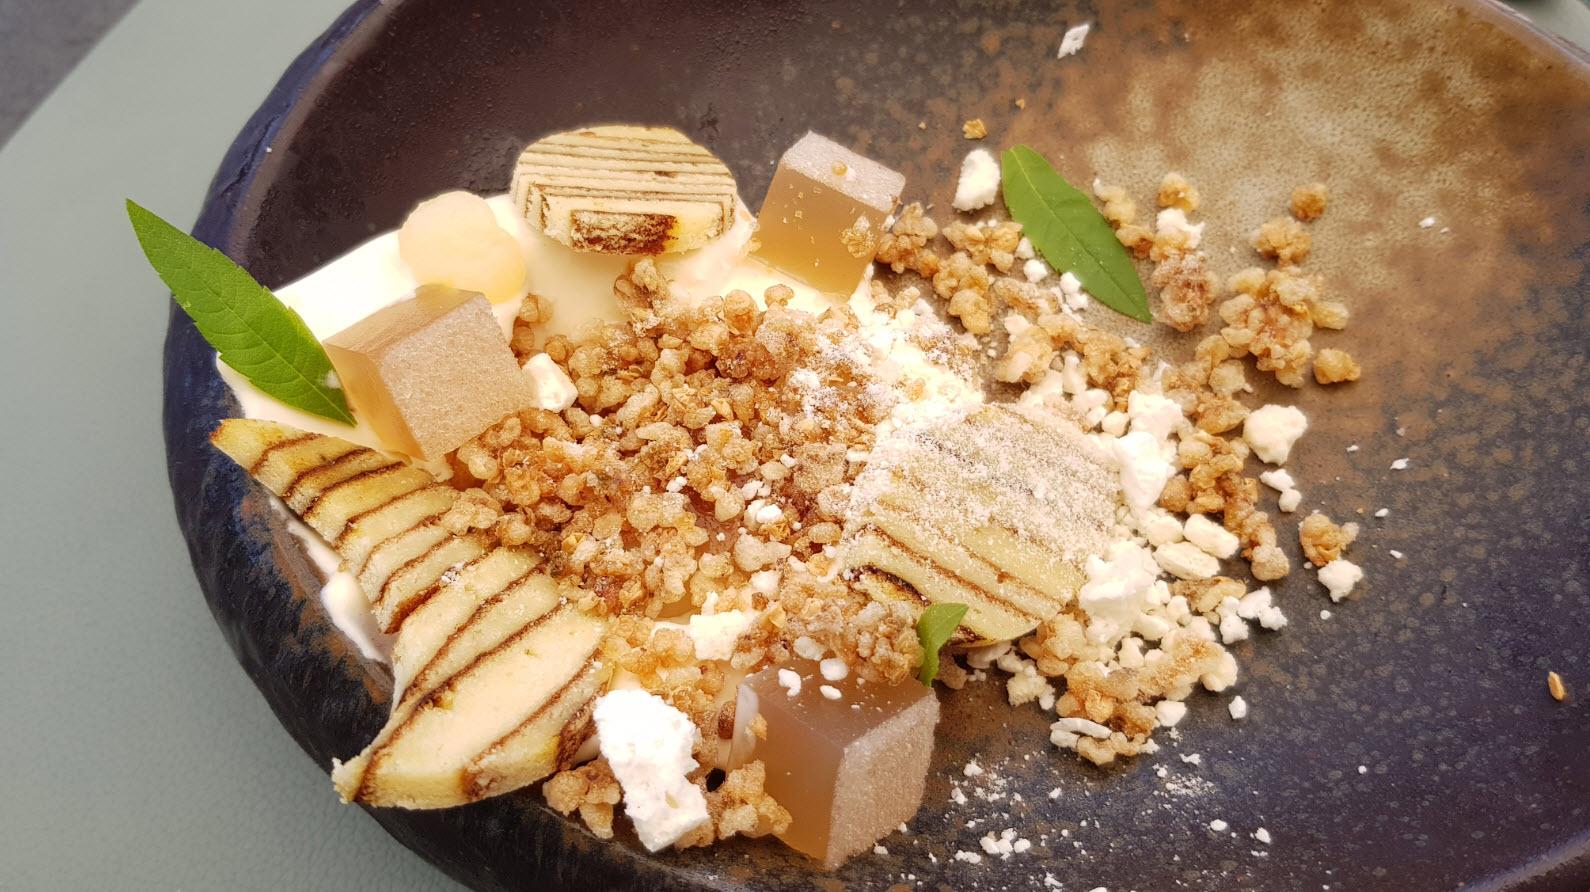 Glace sarrasin, meringue, bière blonde artisanale